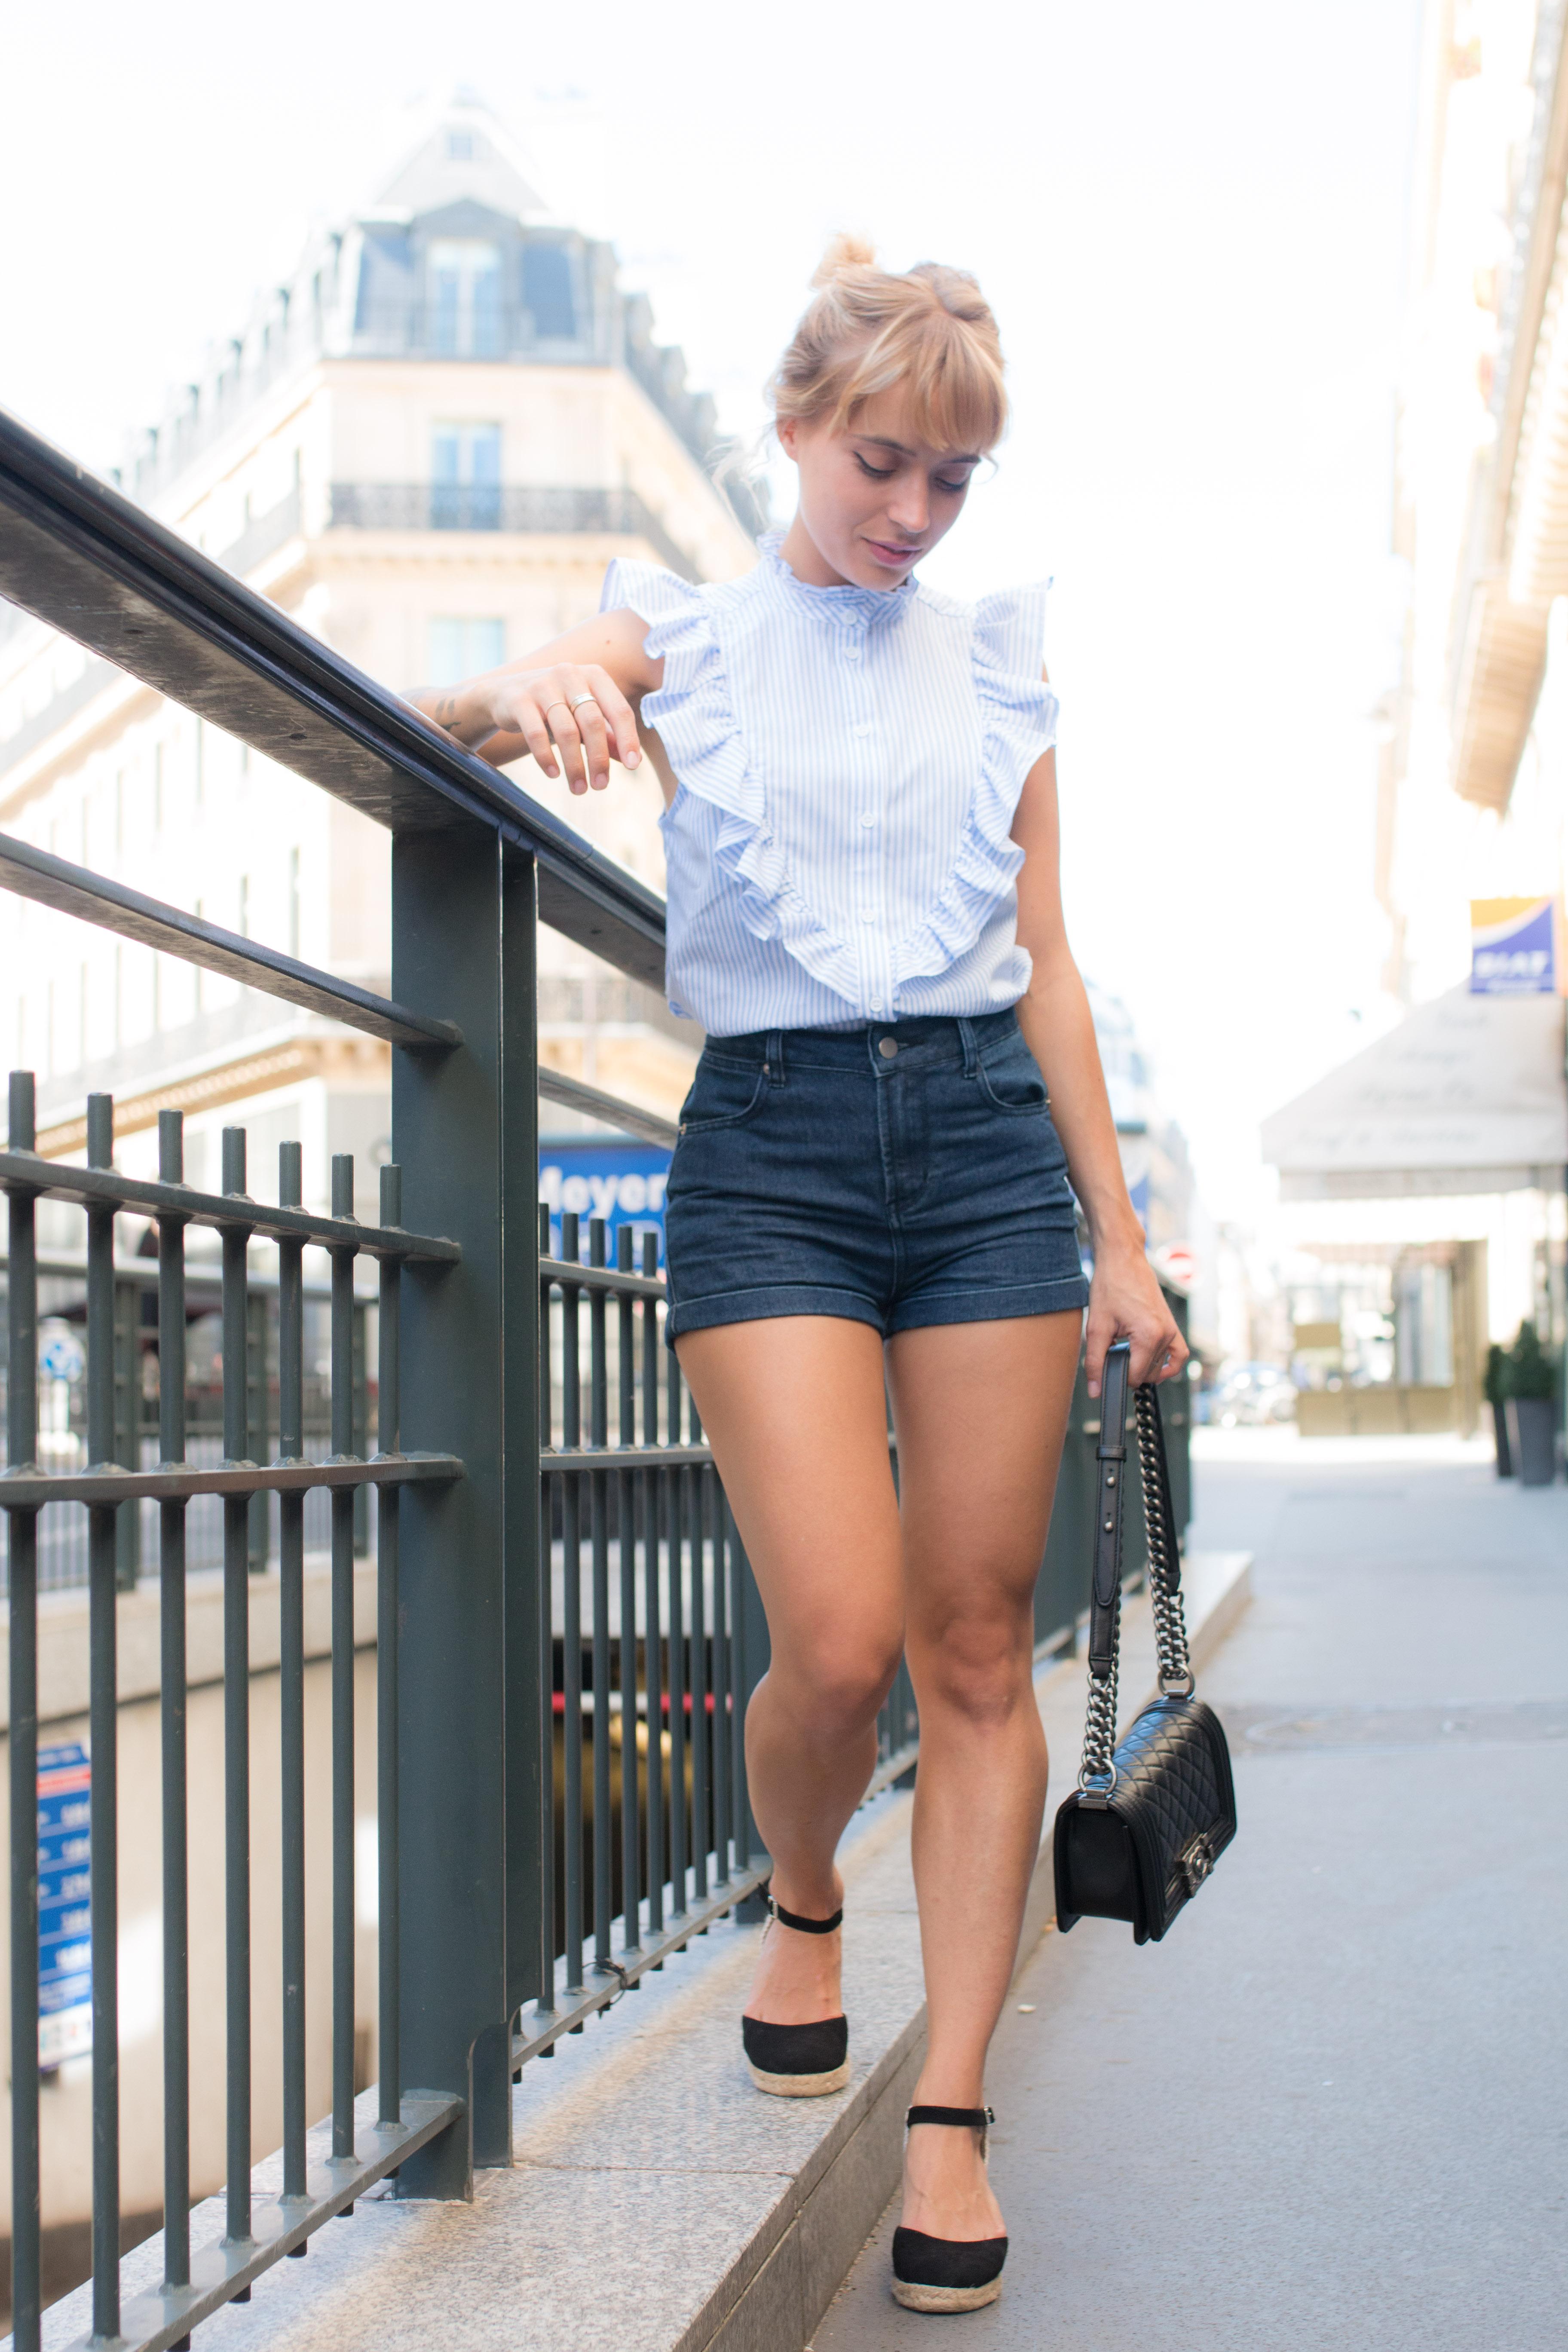 Top froufrou a rayures , short en jean et espadrille I Sp4nkblog-4